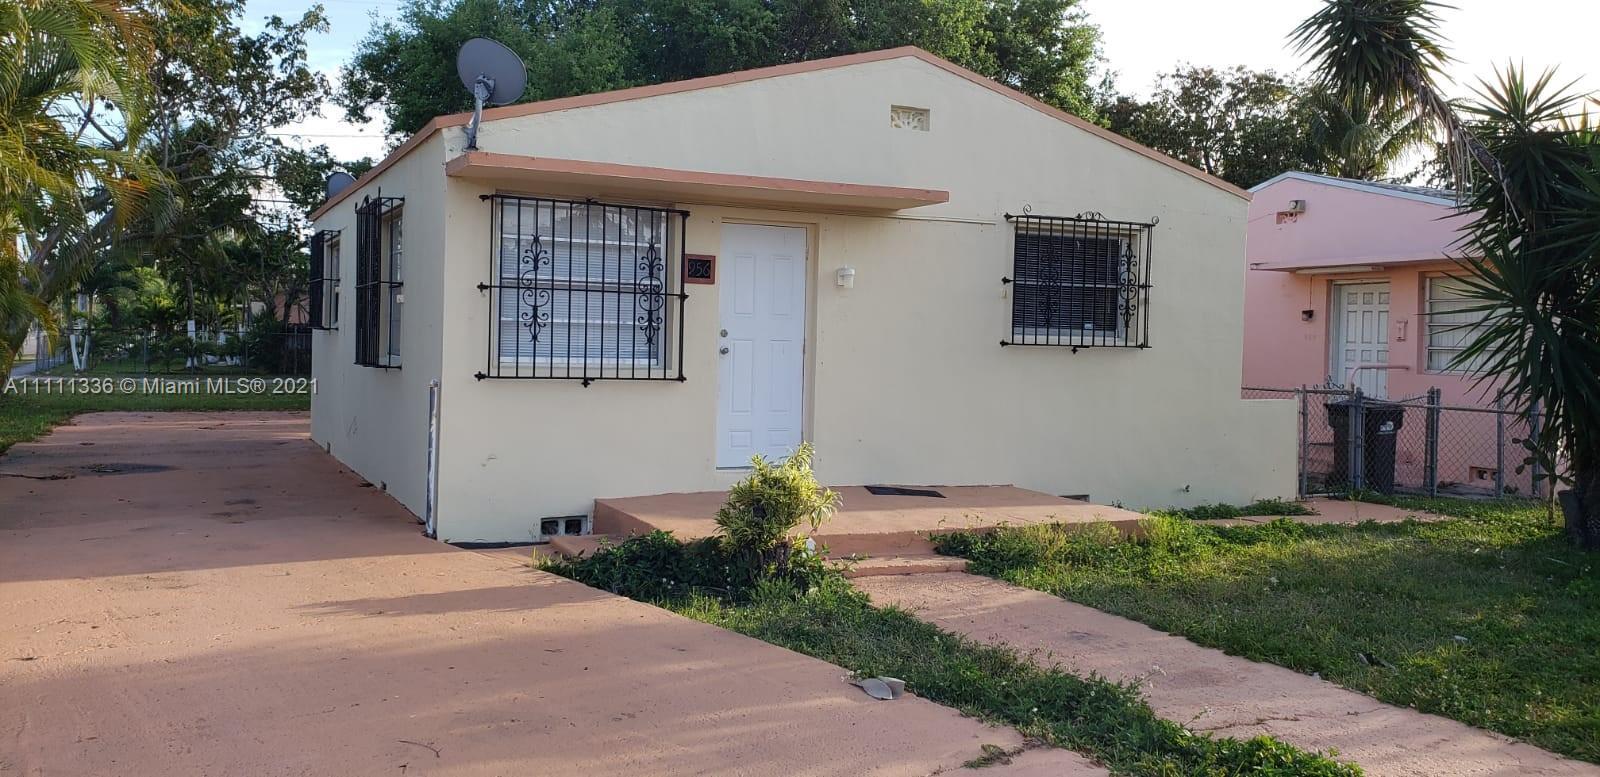 Single Family Home,For Sale,956 Superior St, Opa-Locka, Florida 33054,Brickell,realty,broker,condos near me